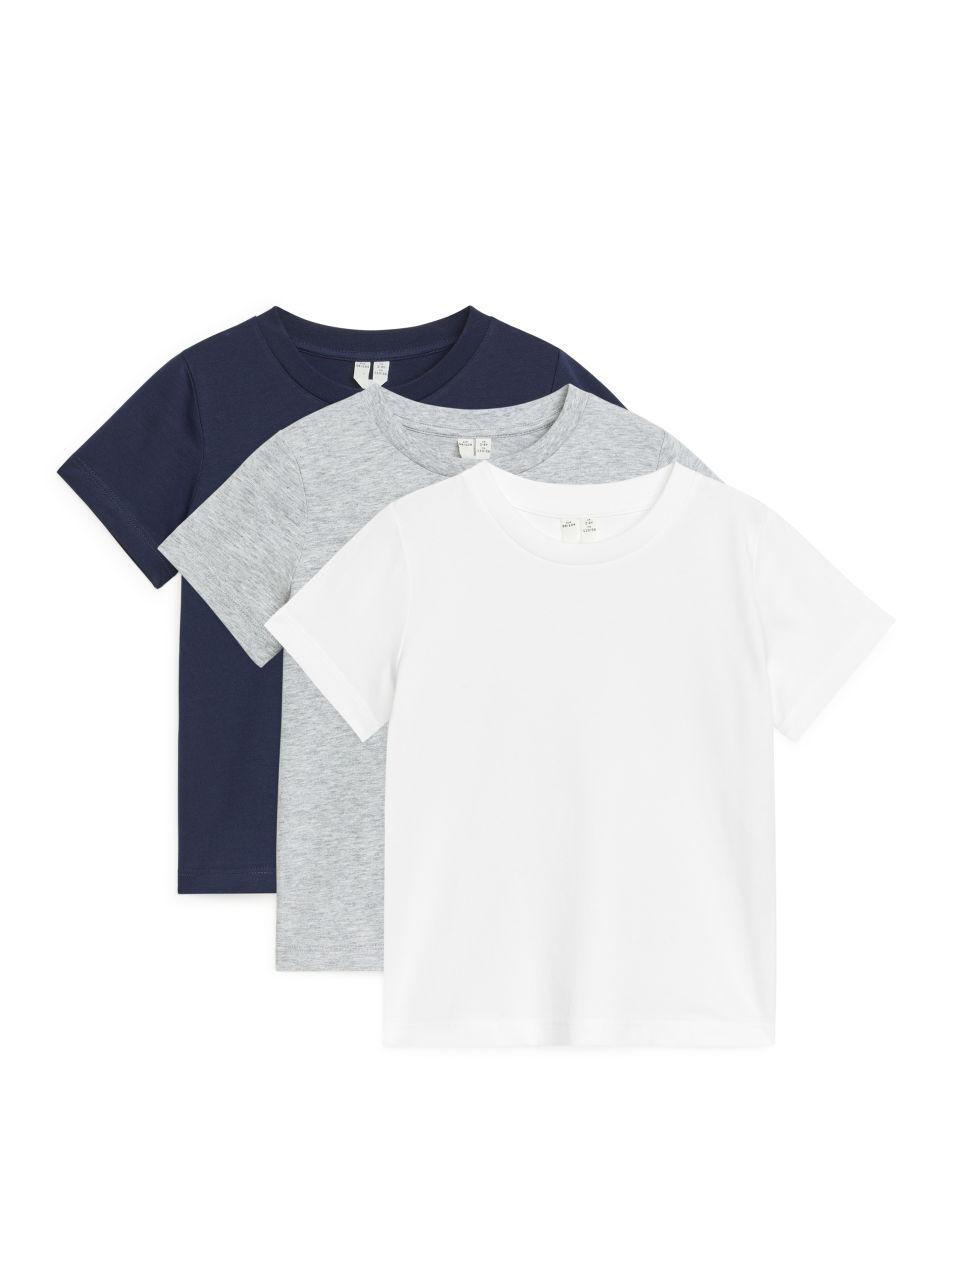 Crew-Neck T-Shirts - White